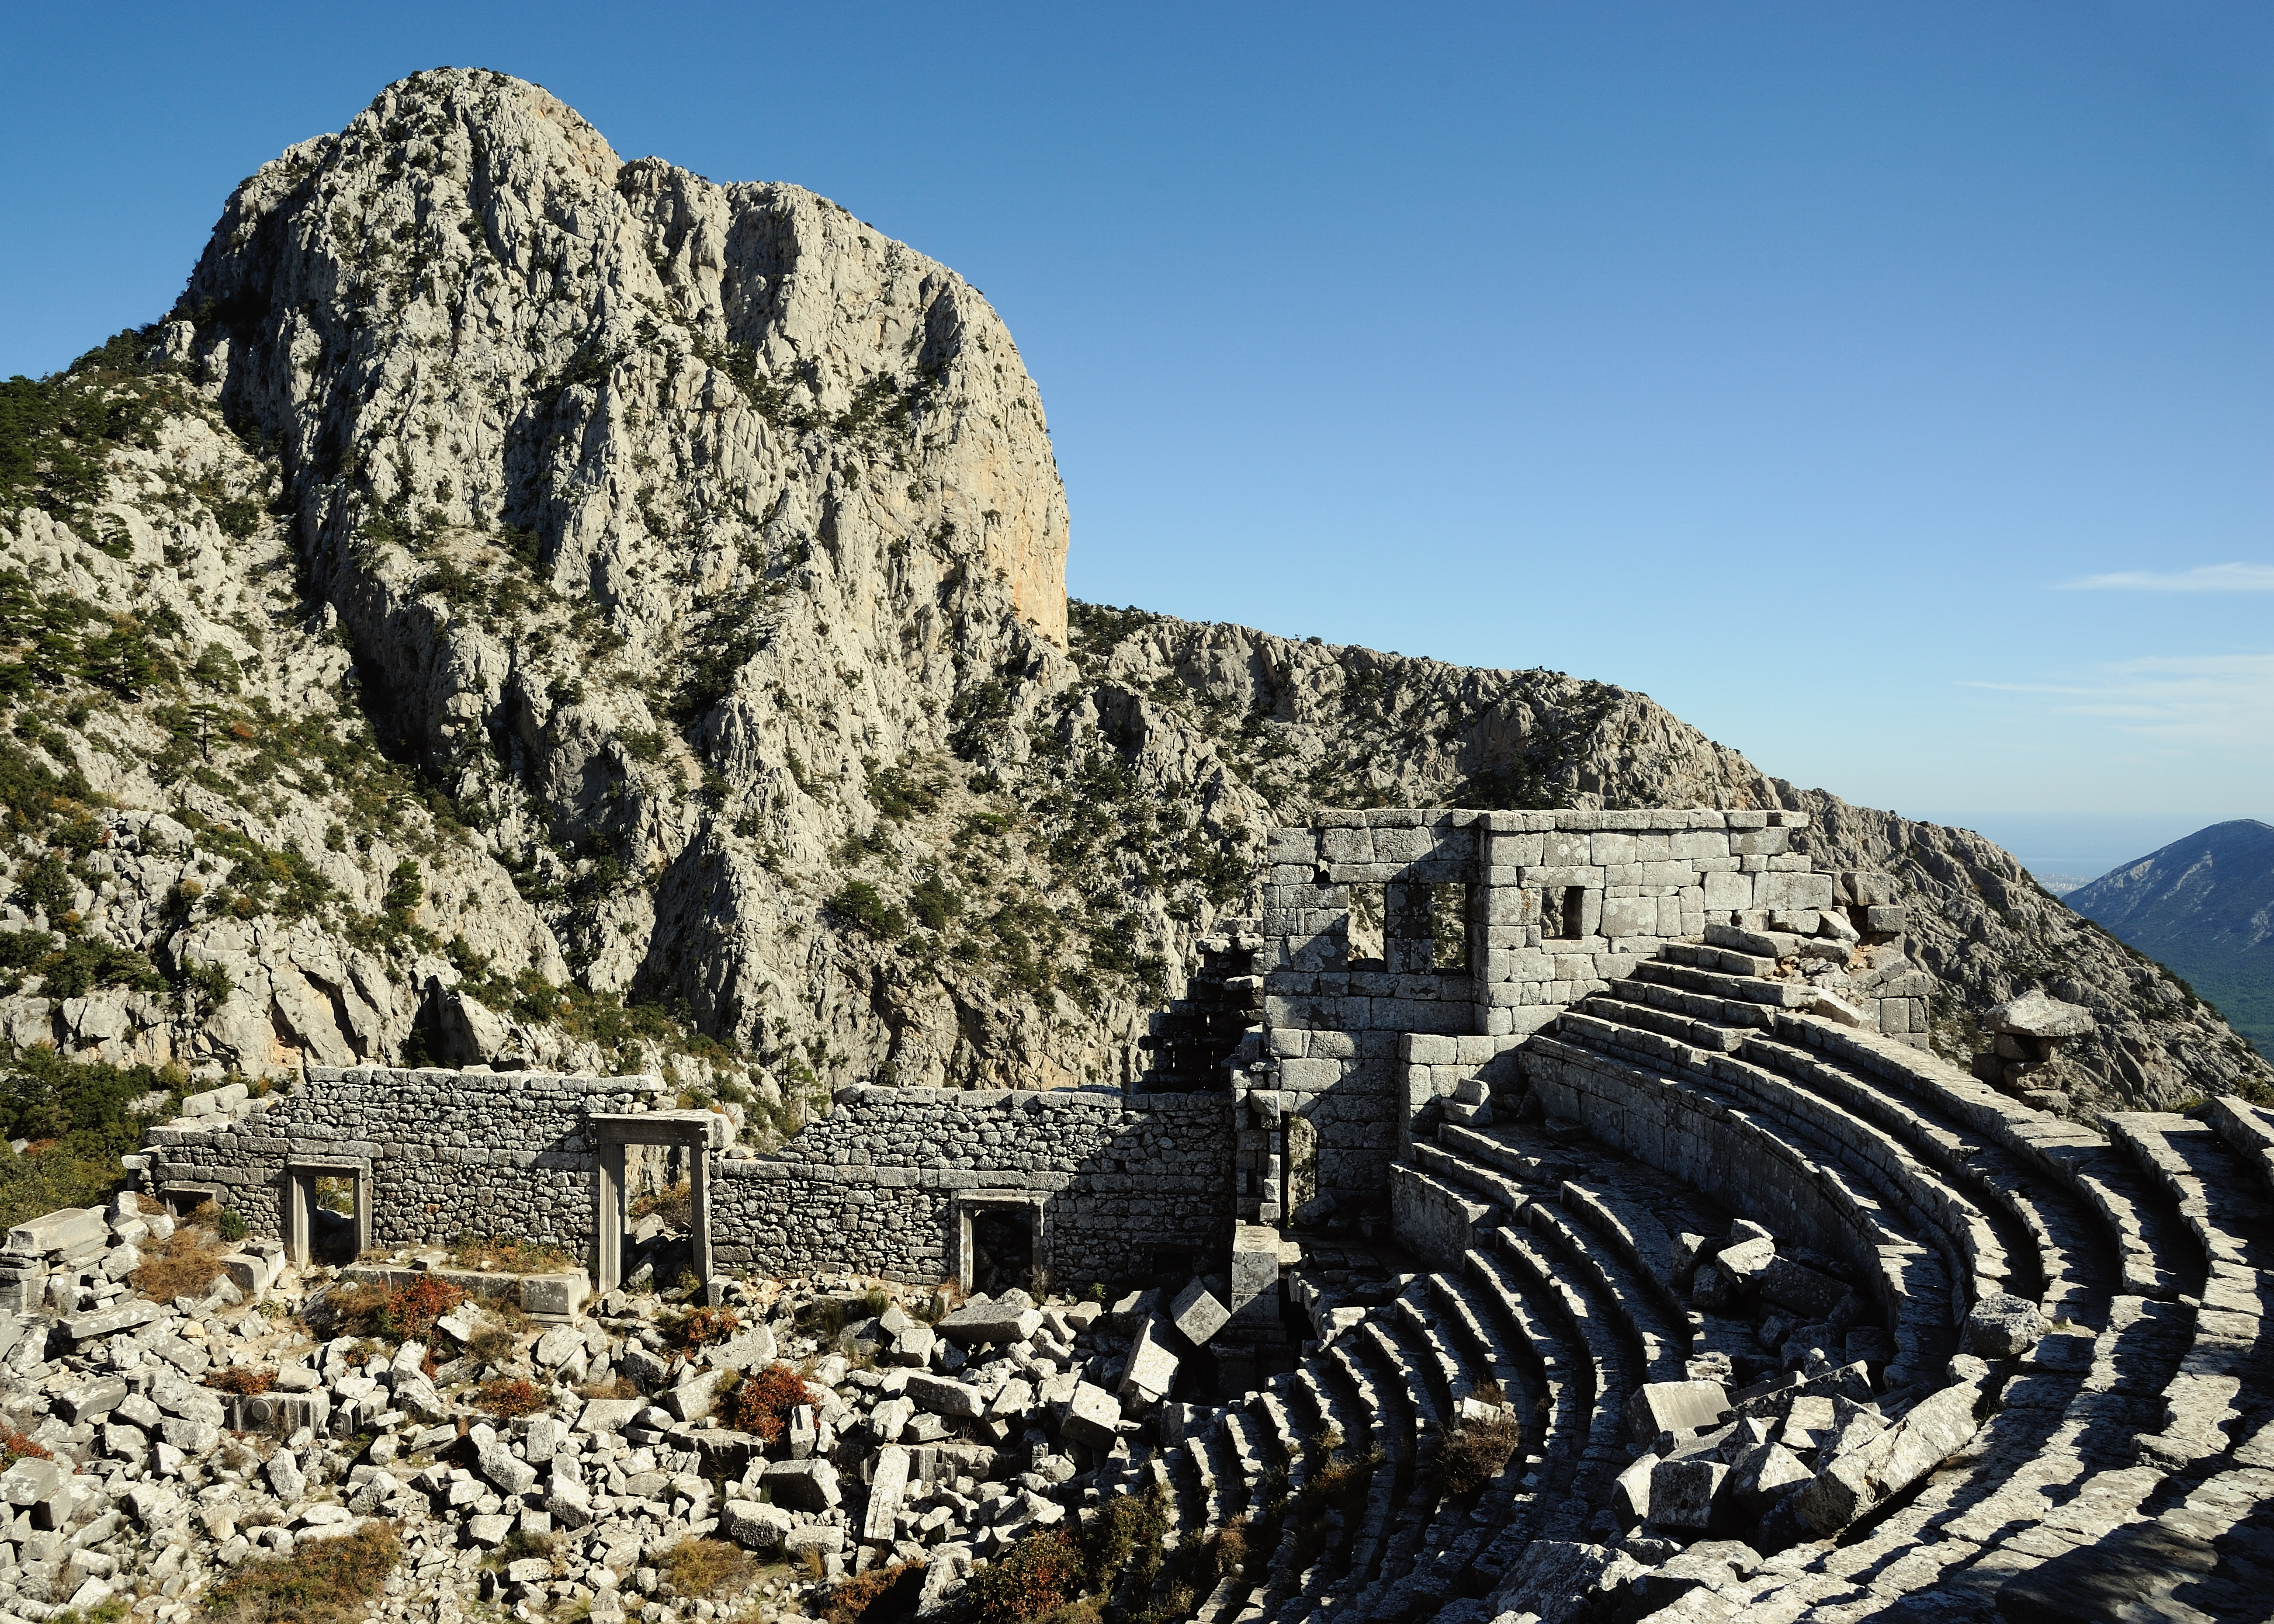 File:Termessos Amphitheatre.jpg - Wikimedia Commons